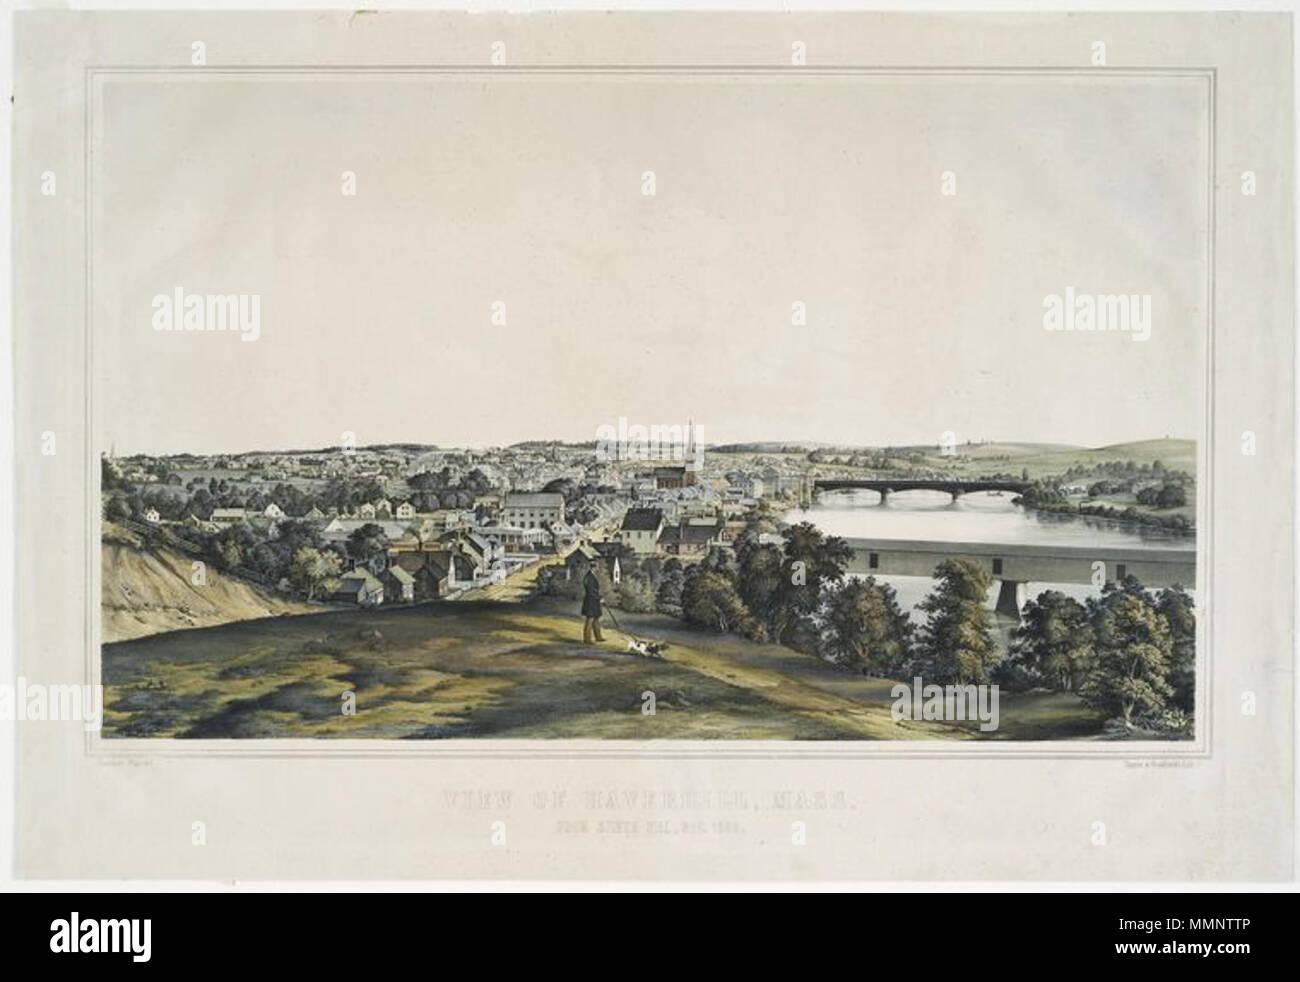 Stokes Hill Stockfotos & Stokes Hill Bilder - Alamy